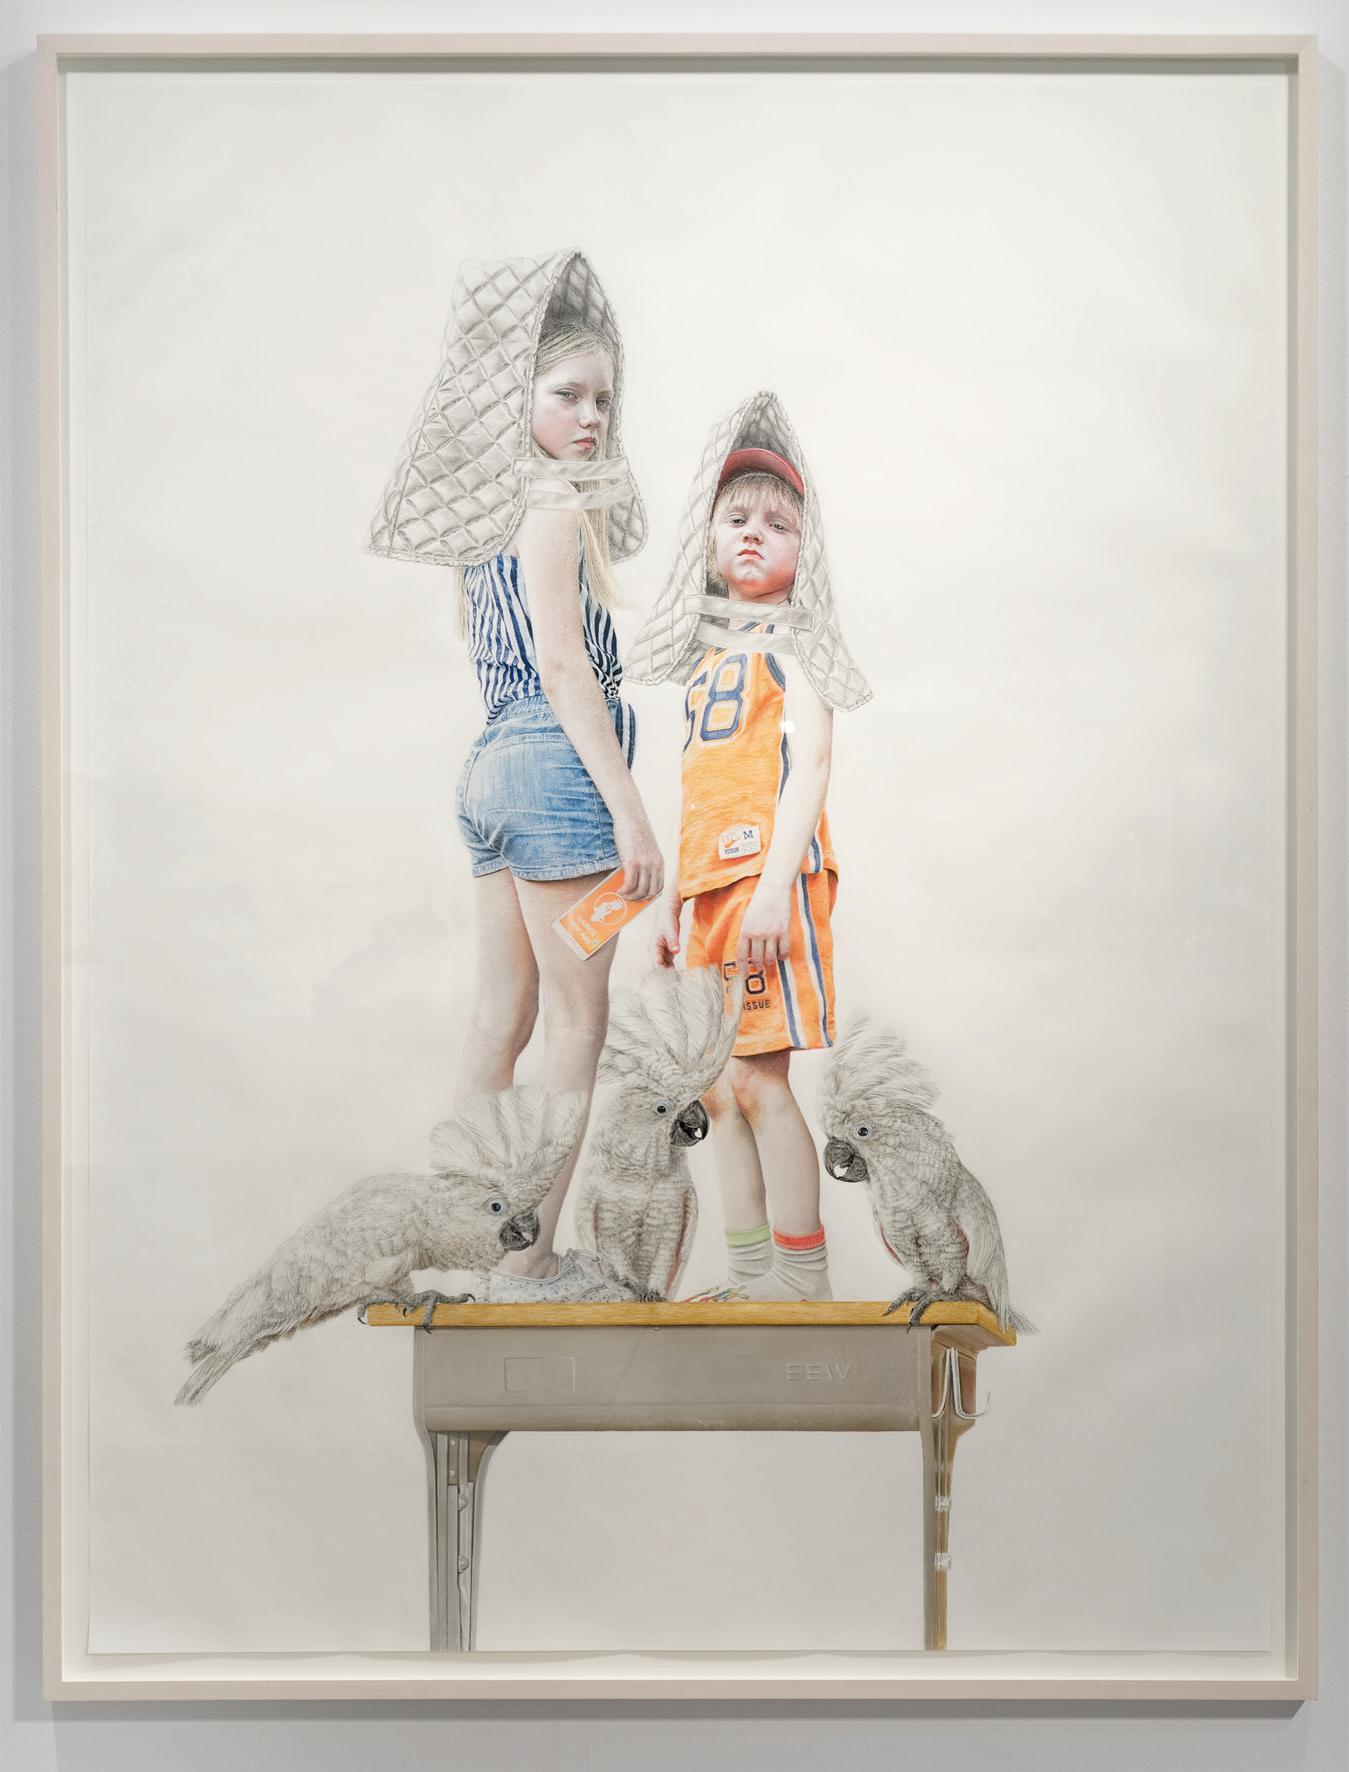 Chalk pastels on paper, frame: marple white glazed, 200cm x 152cm, 2016, Photograph: © Andreas Baudisch, Galerie Gerken